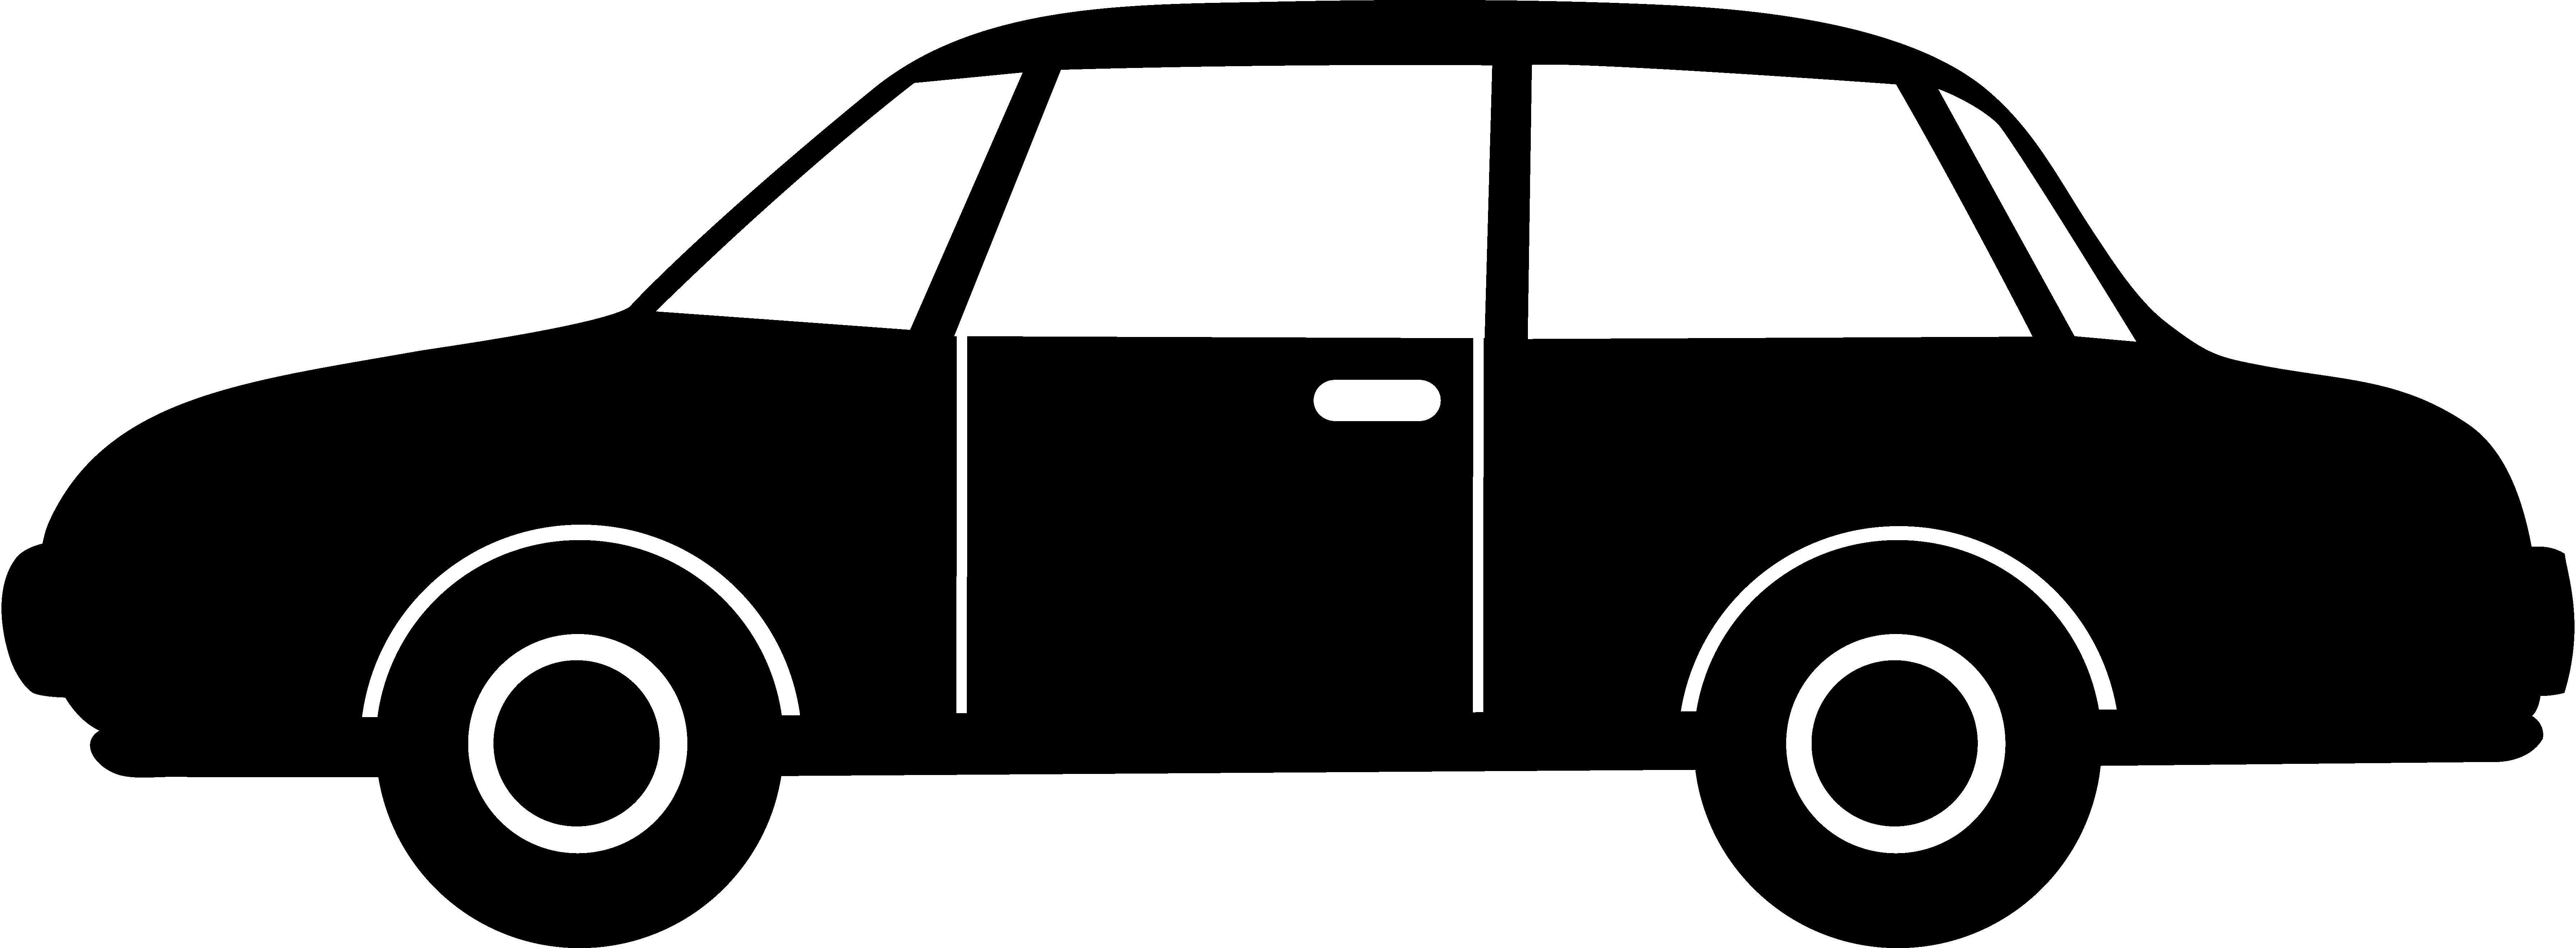 Black Car Silhouette - Free .